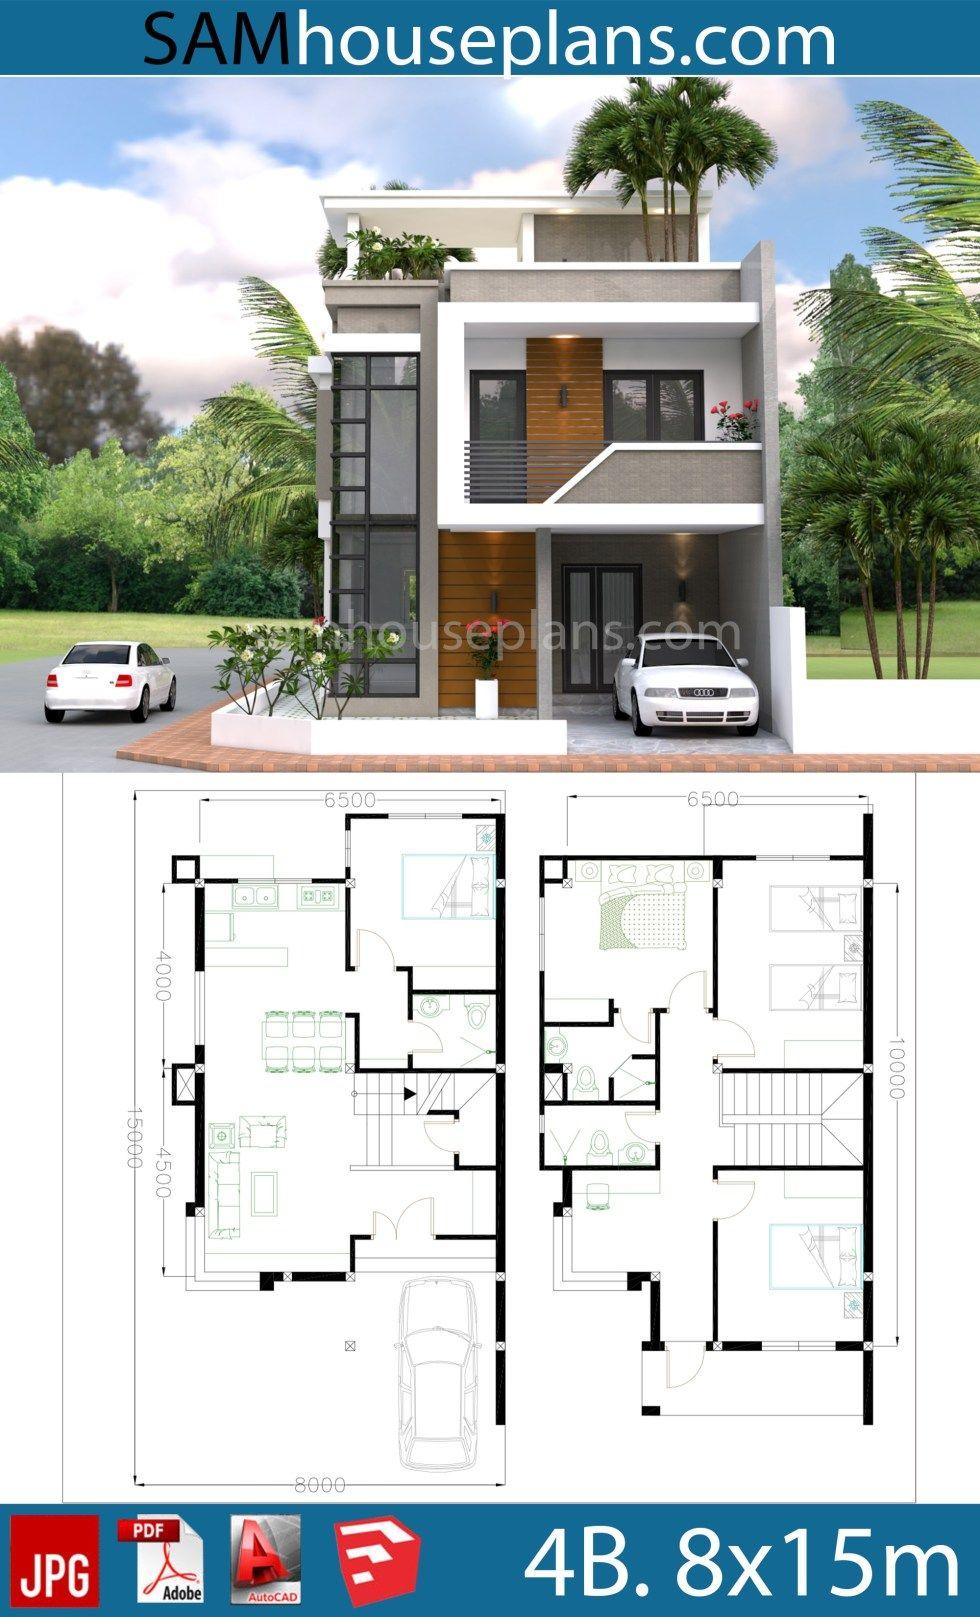 House Plans 8x15m With 4 Bedrooms Sam House Plans House Construction Plan Duplex House Design Model House Plan